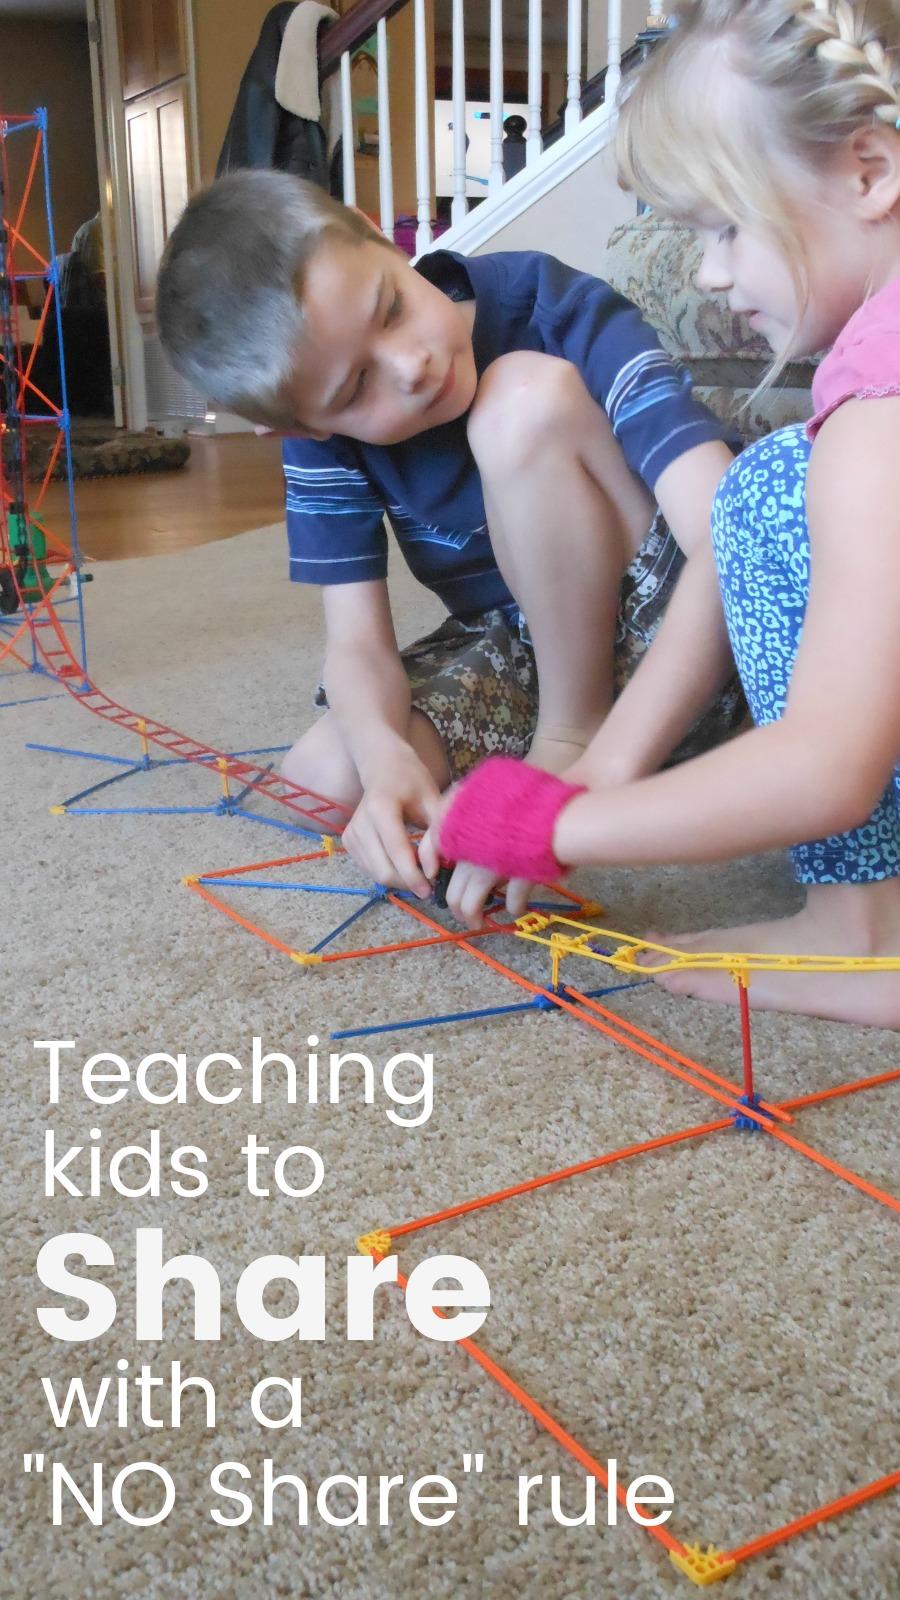 teaching kids to share, siblings, how to, parenting tips, toddler, preschool, kindergarten, school age, positive parenting, #parenting101 #siblingrivalry